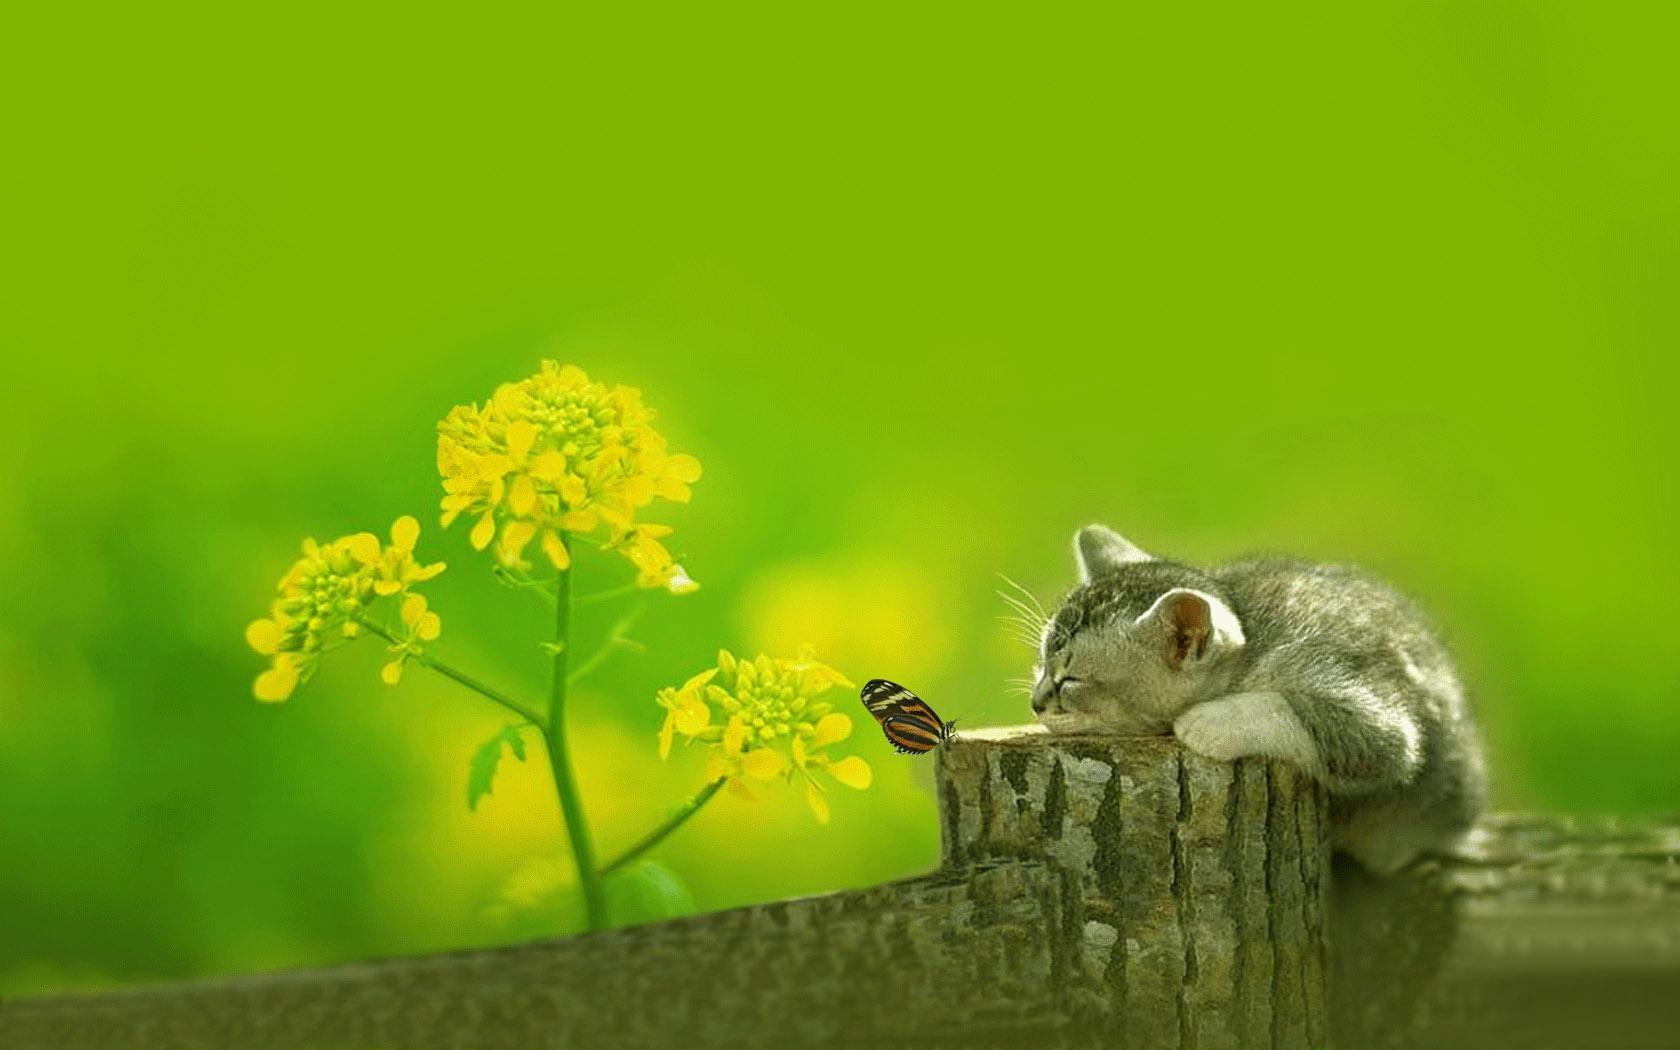 Best Wallpaper Cat Butterfly - 06d19023198493e129ac4ea2f26a1834  2018_194758 .jpg